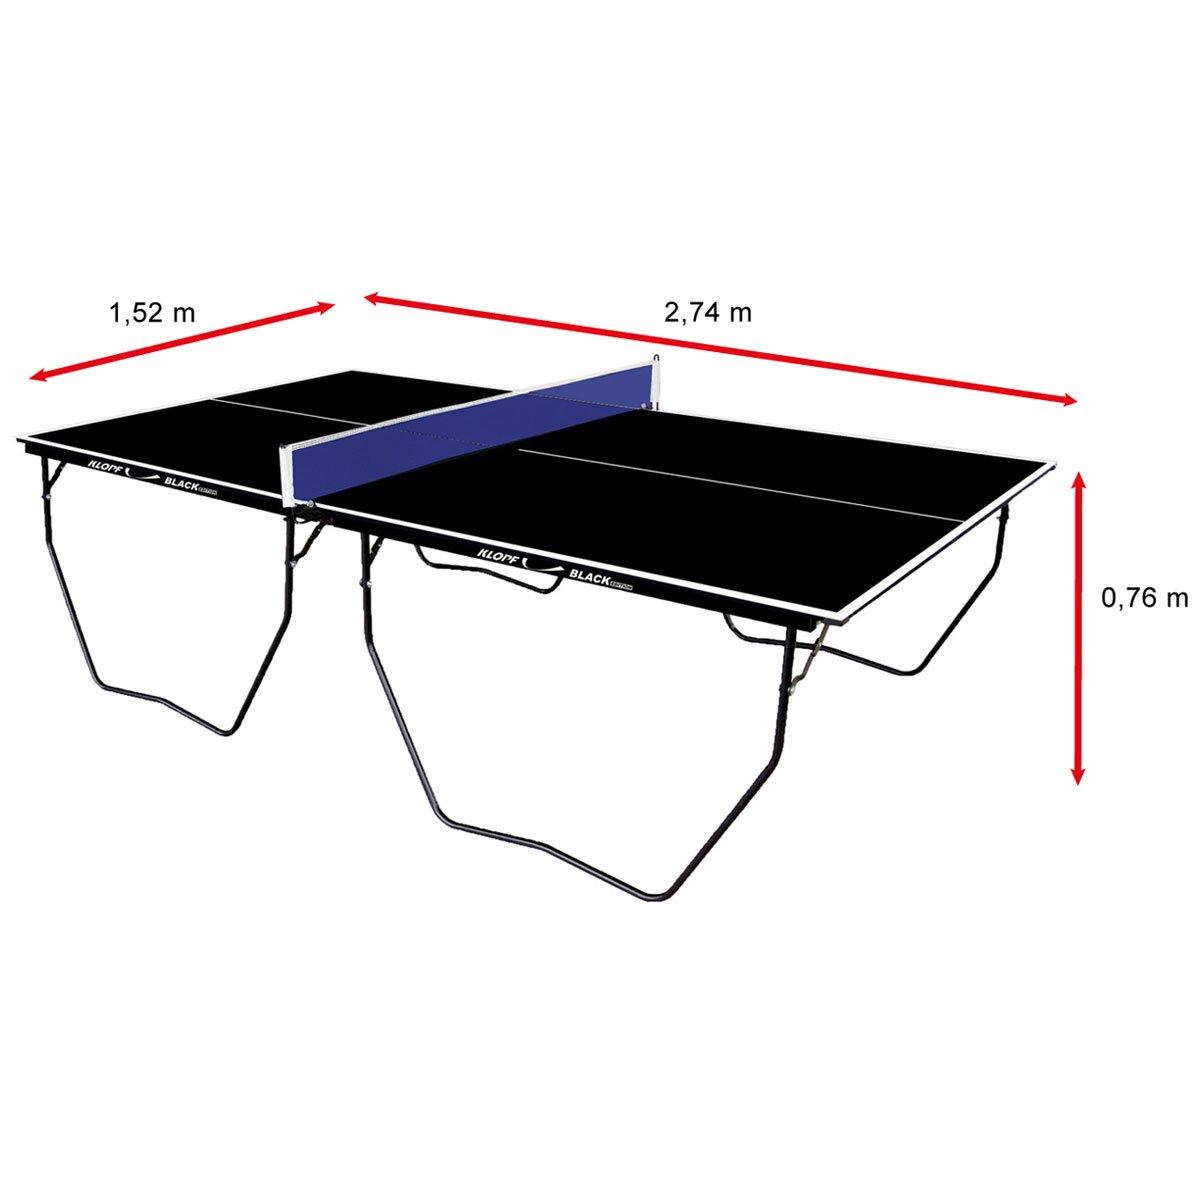 7b9fcb728a208 Mesa de Ping Pong   Tênis de Mesa Klopf Oficial Black Edition - 15 mm -  Preto - Compre Agora